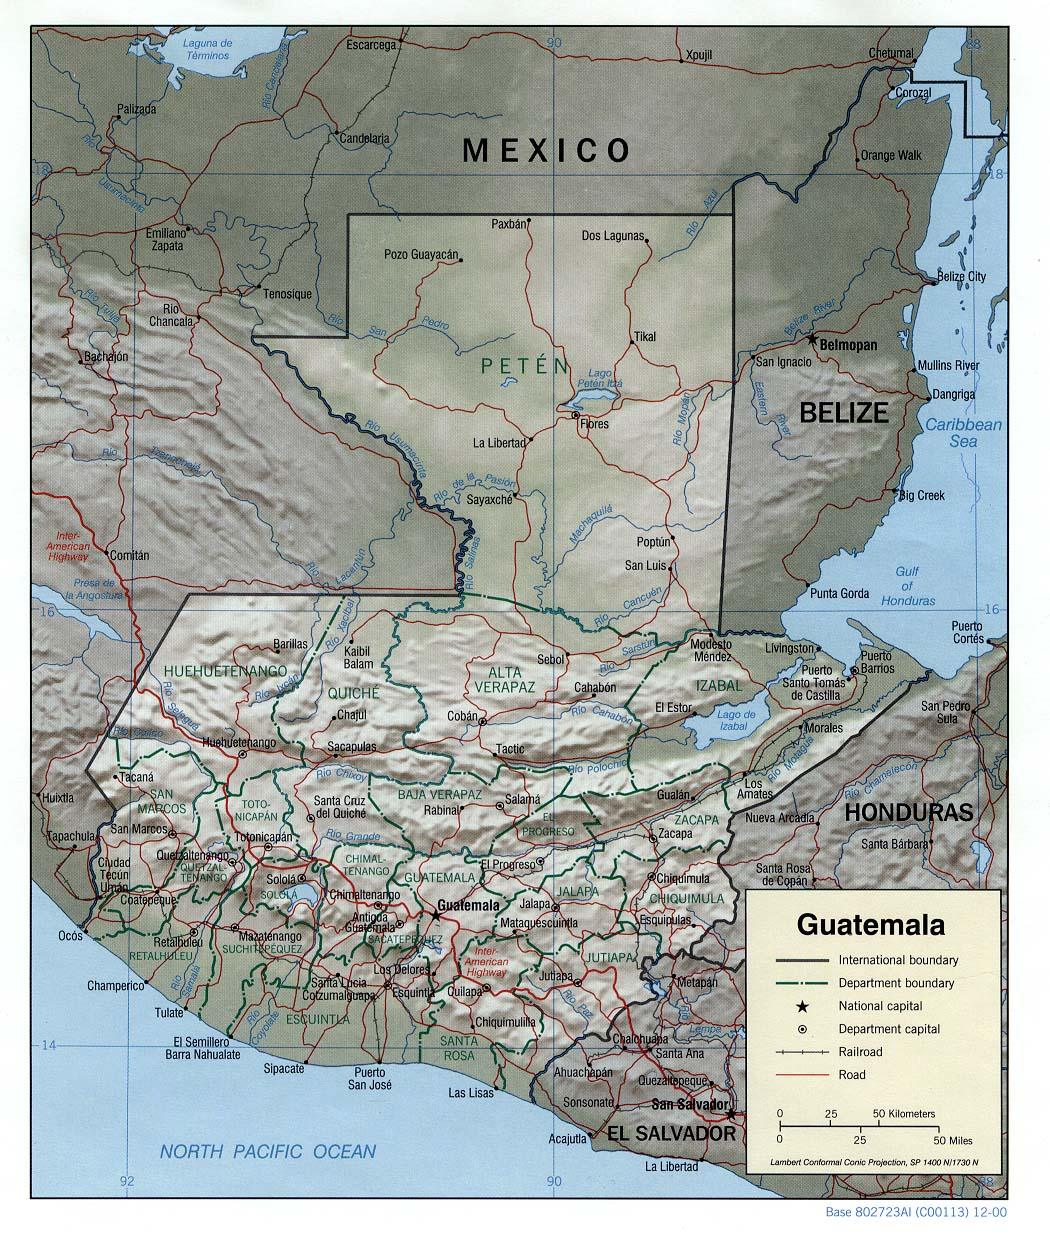 Guatemala geopolitical.jpg